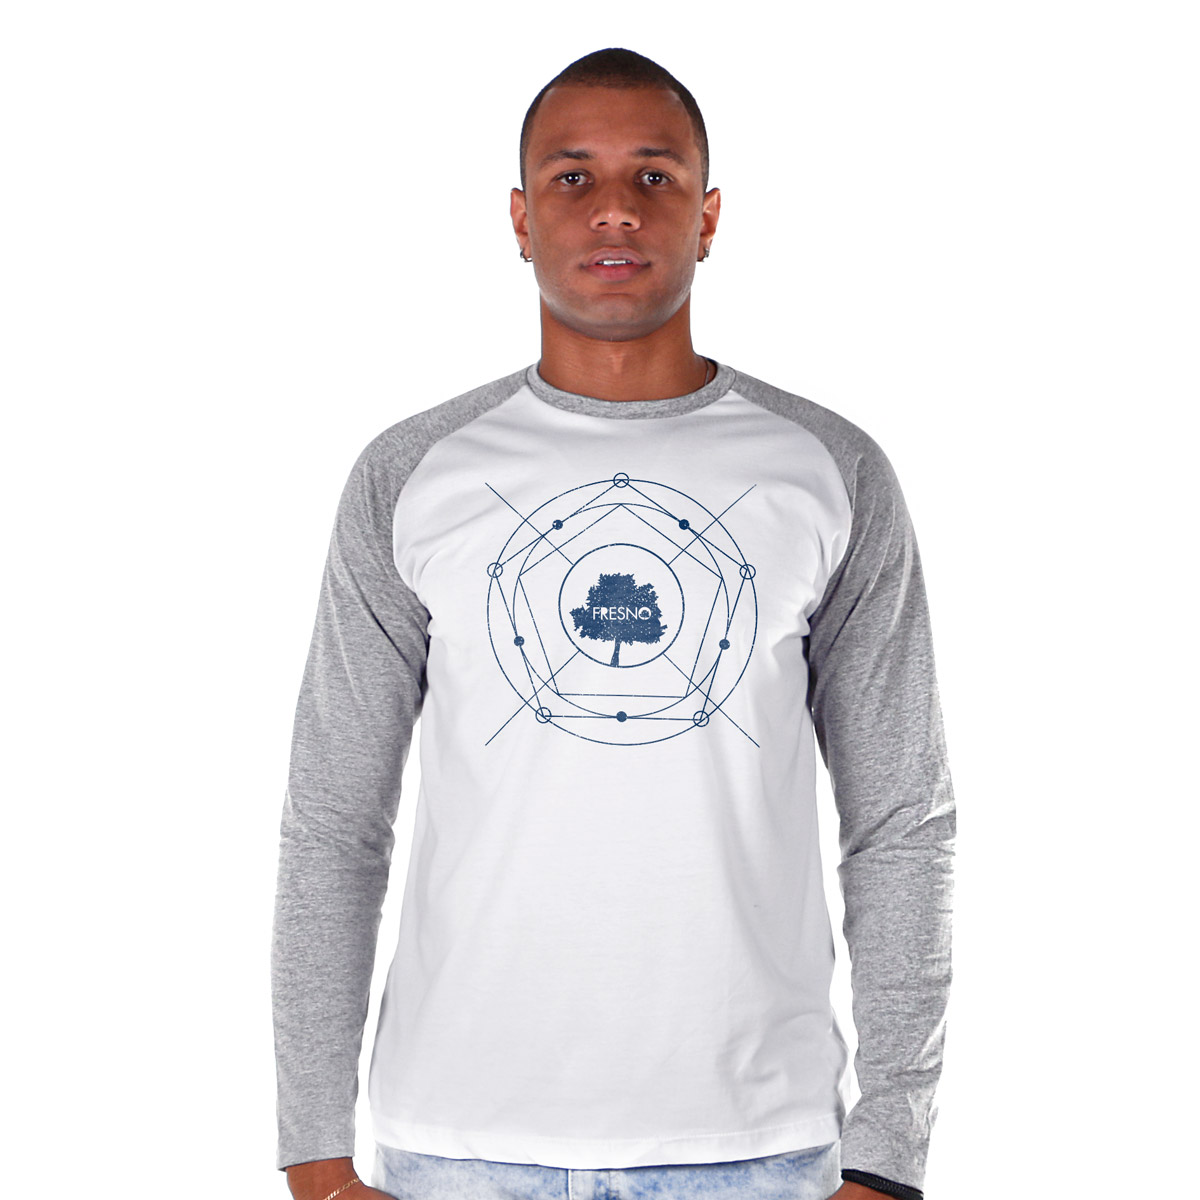 Camiseta Raglan Masculina Fresno Árvore Diagrama